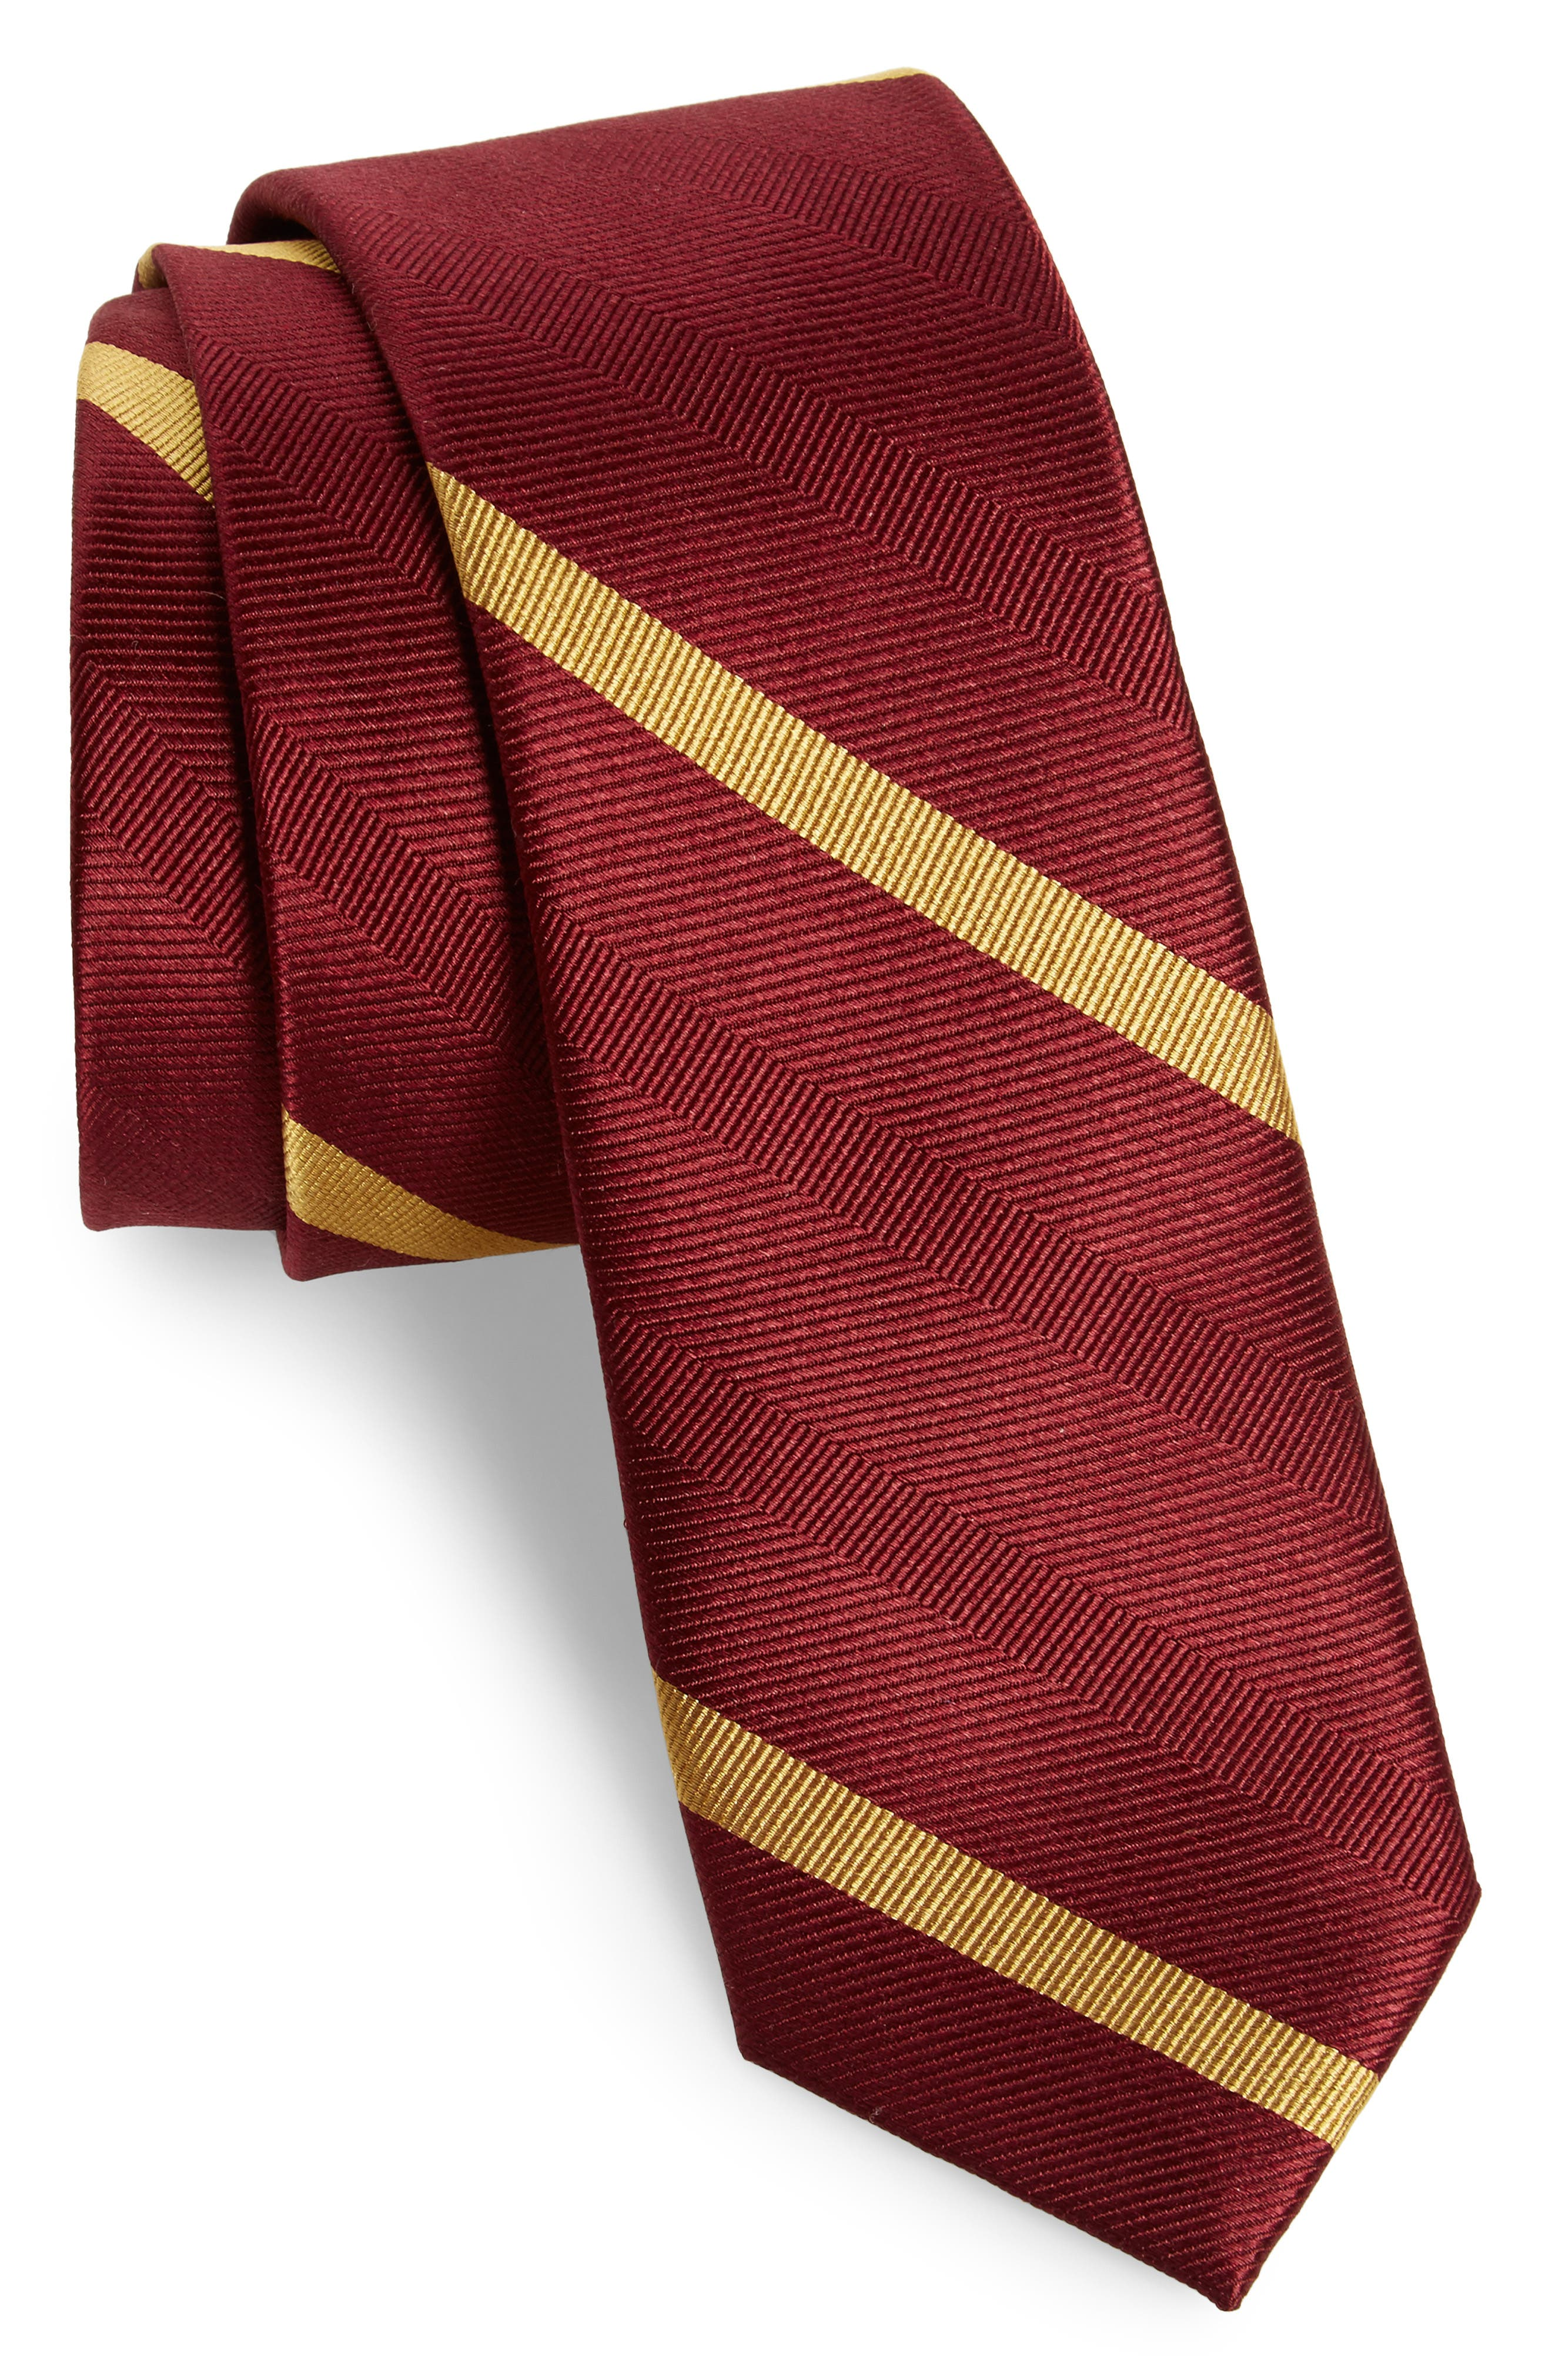 Main Image - The Tie Bar Goal Line Stripe Silk Skinny Tie